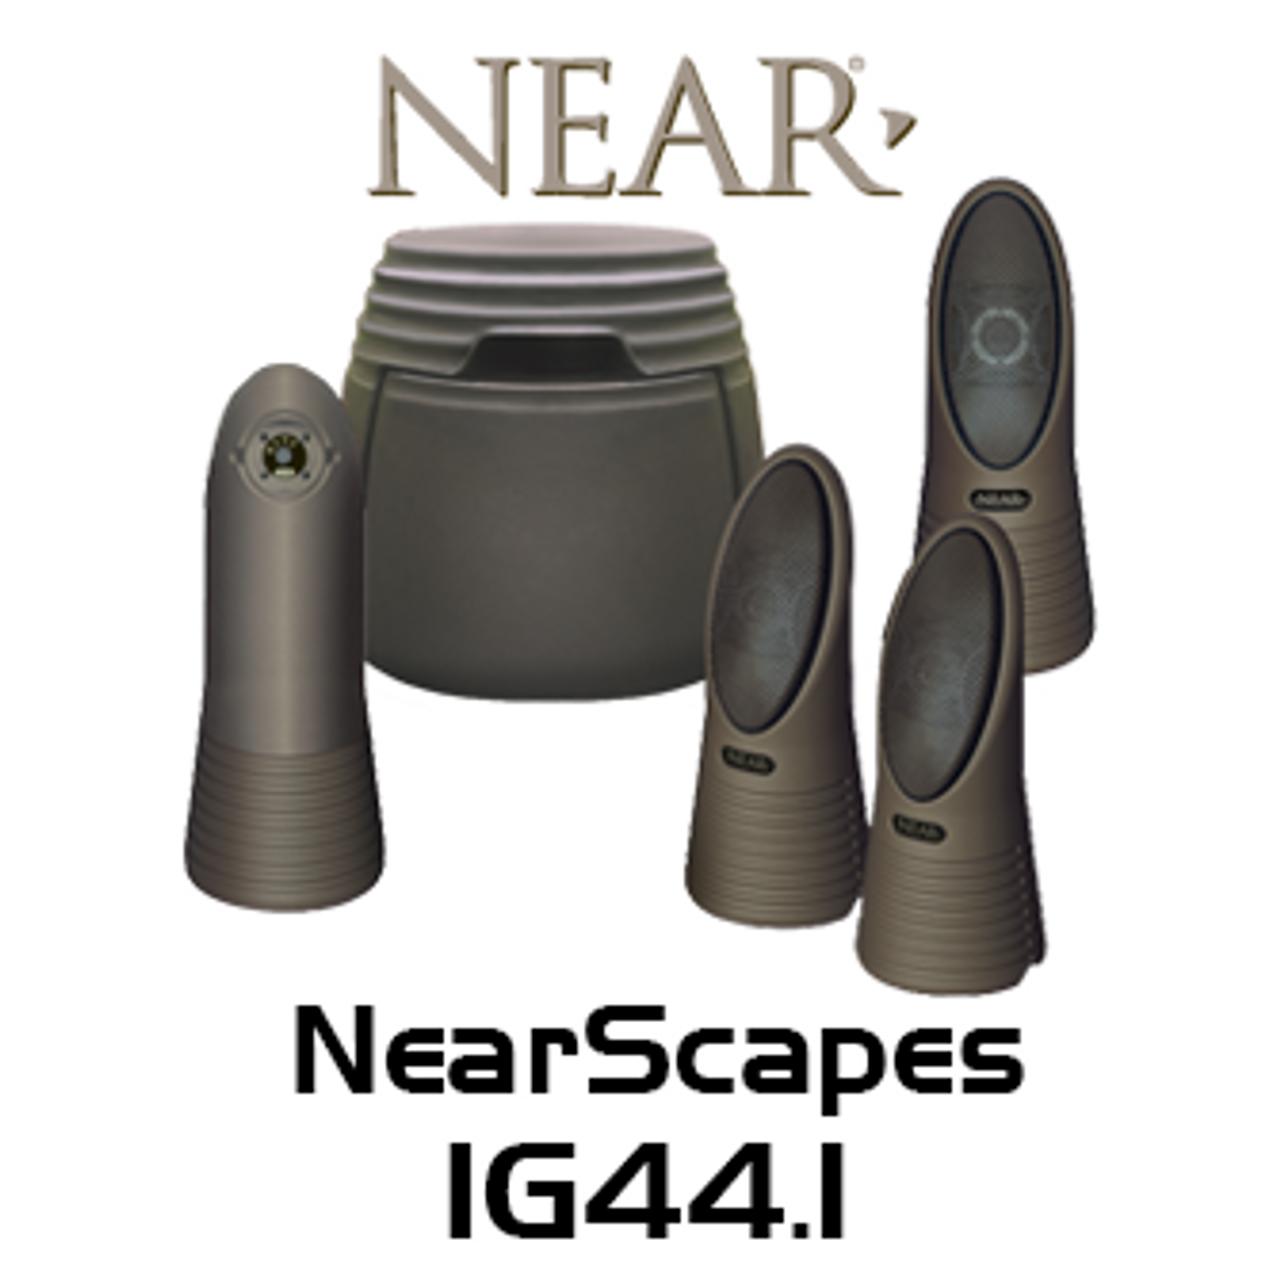 Near NearScapes IG44.1 Outdoor Bollard-Style Speaker System